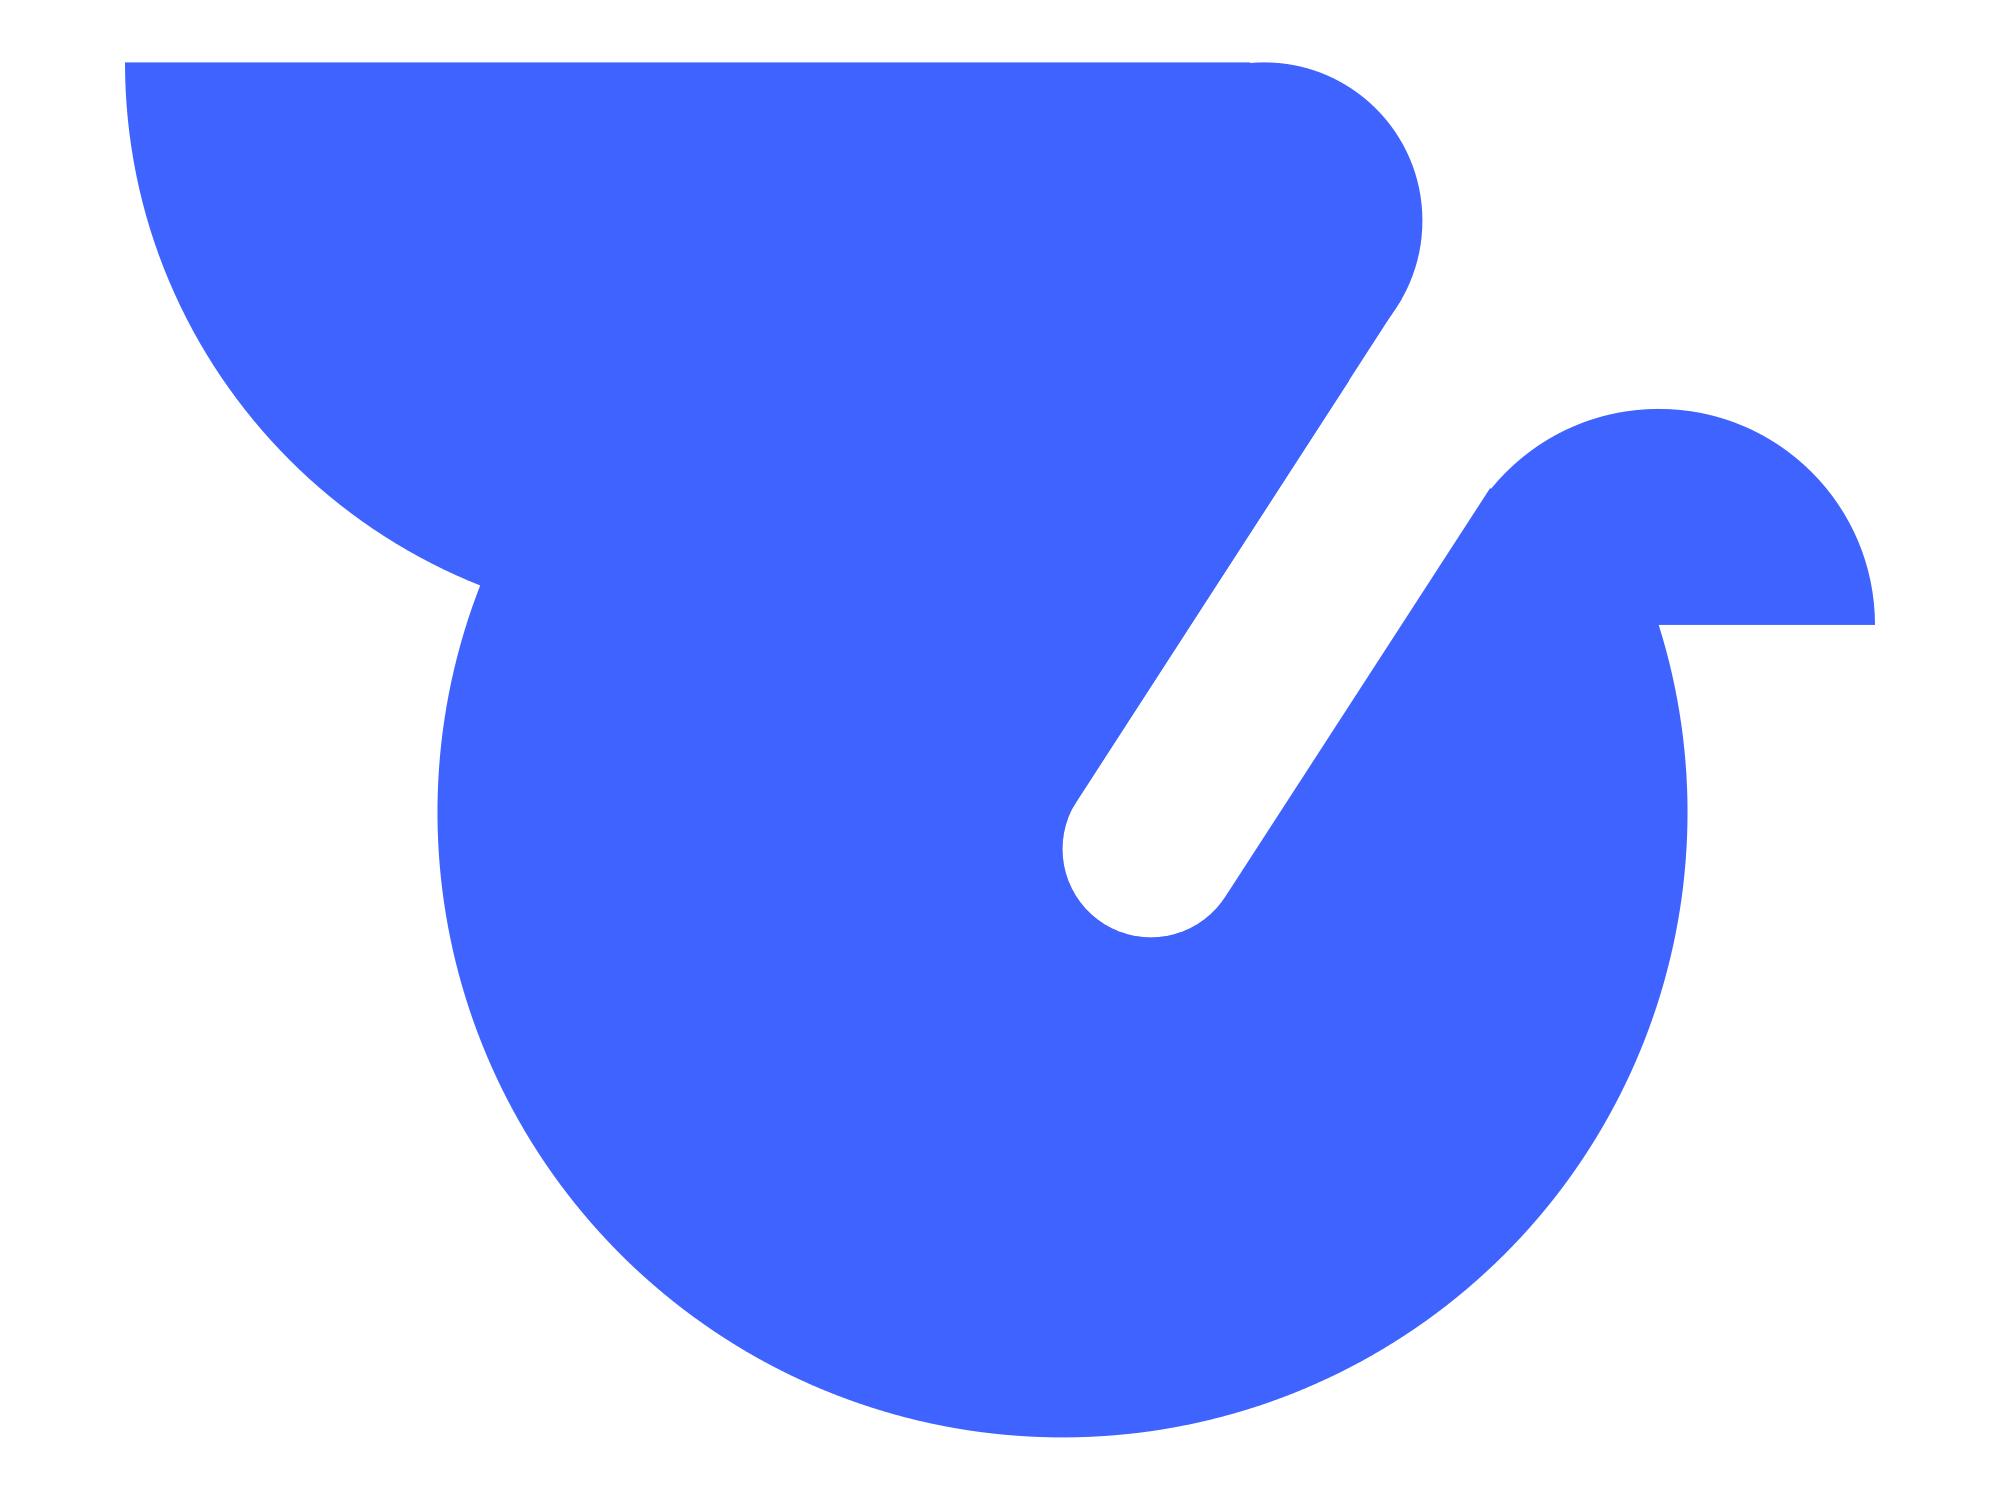 File:Emblem of Higashiosaka.svg.